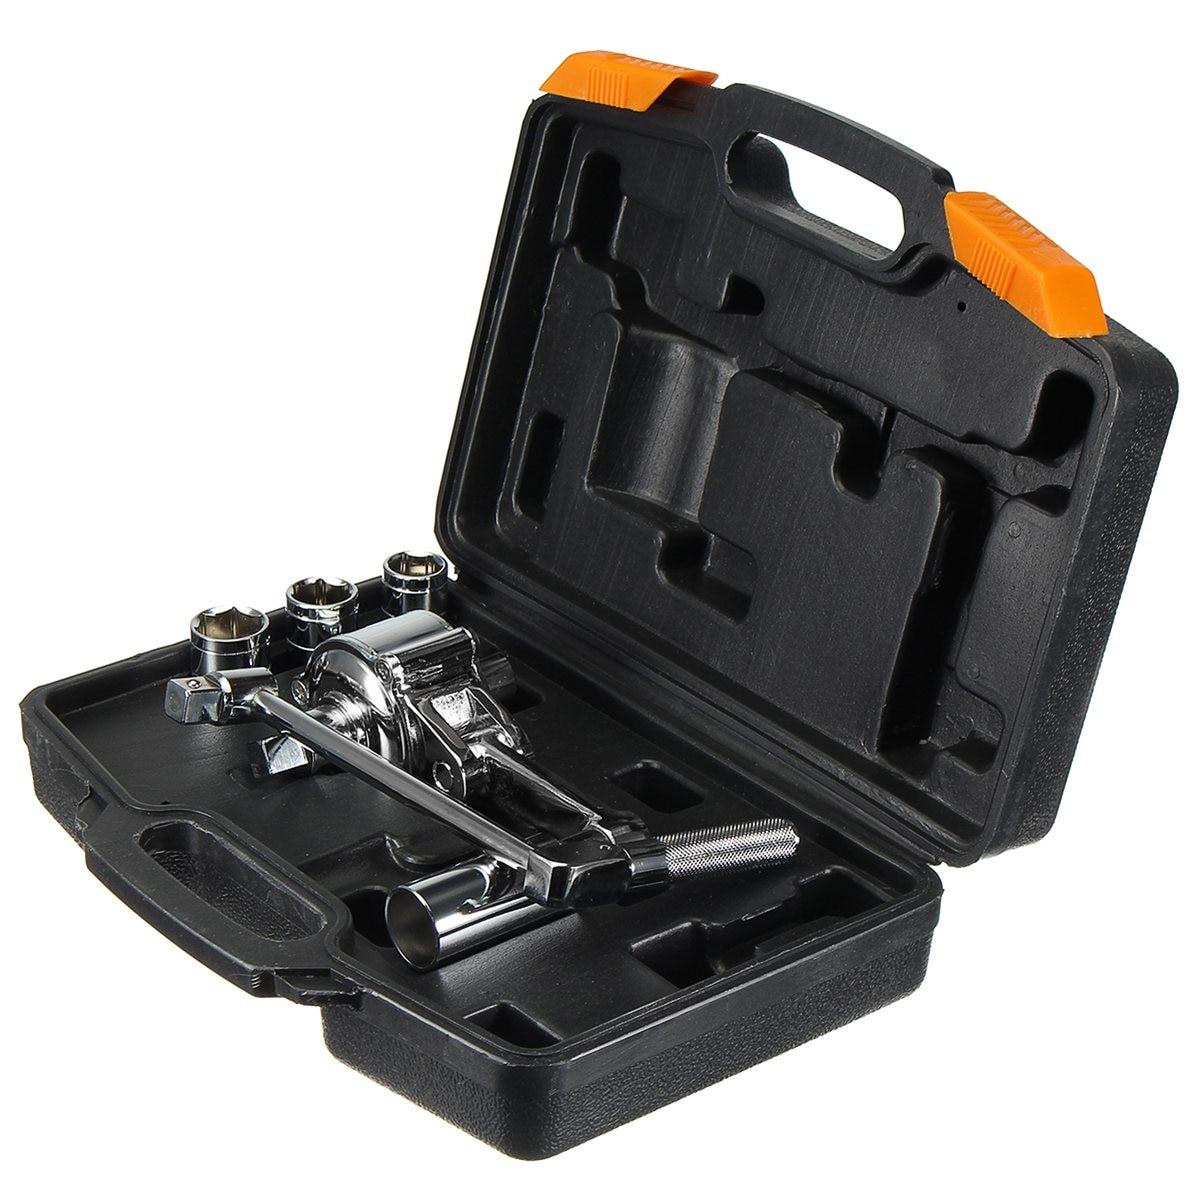 1 set Torque Multiplier Wrench Lug Nut Remover 1/2 Drive Socket 17 19 21mm Tire Change